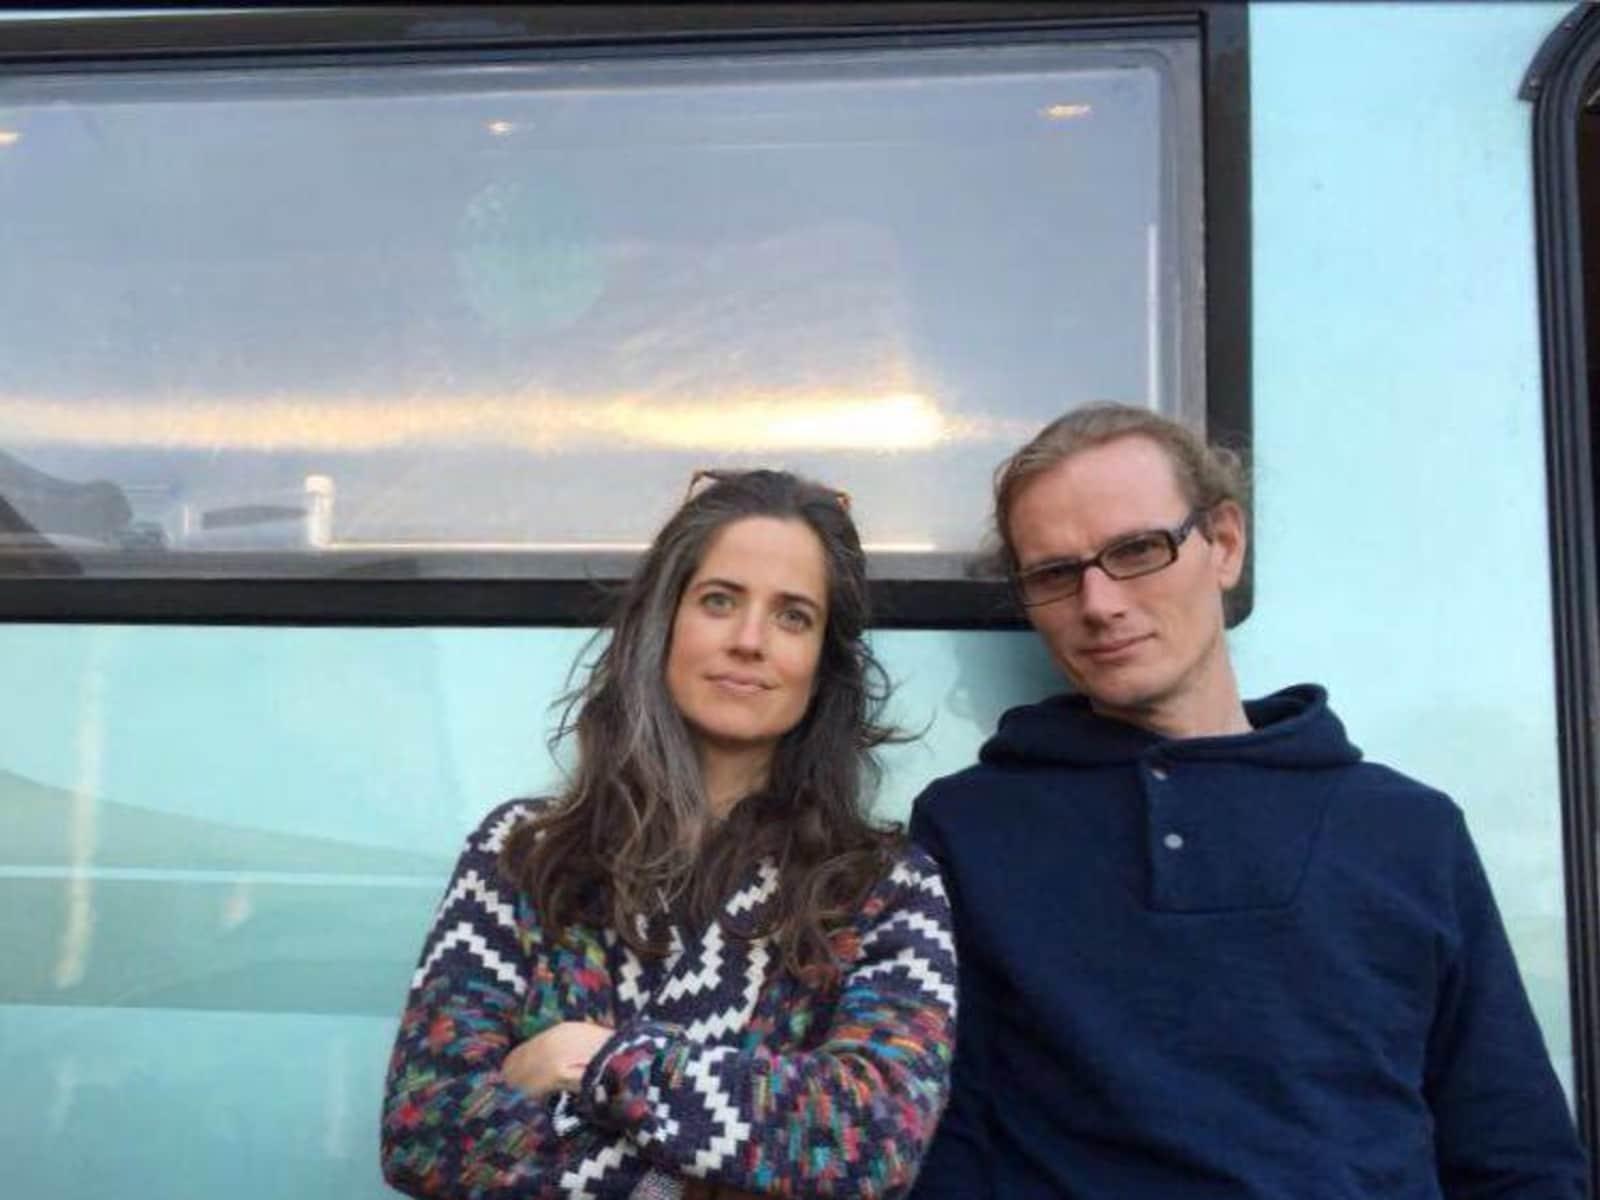 Femke & Robert from Amsterdam, Netherlands